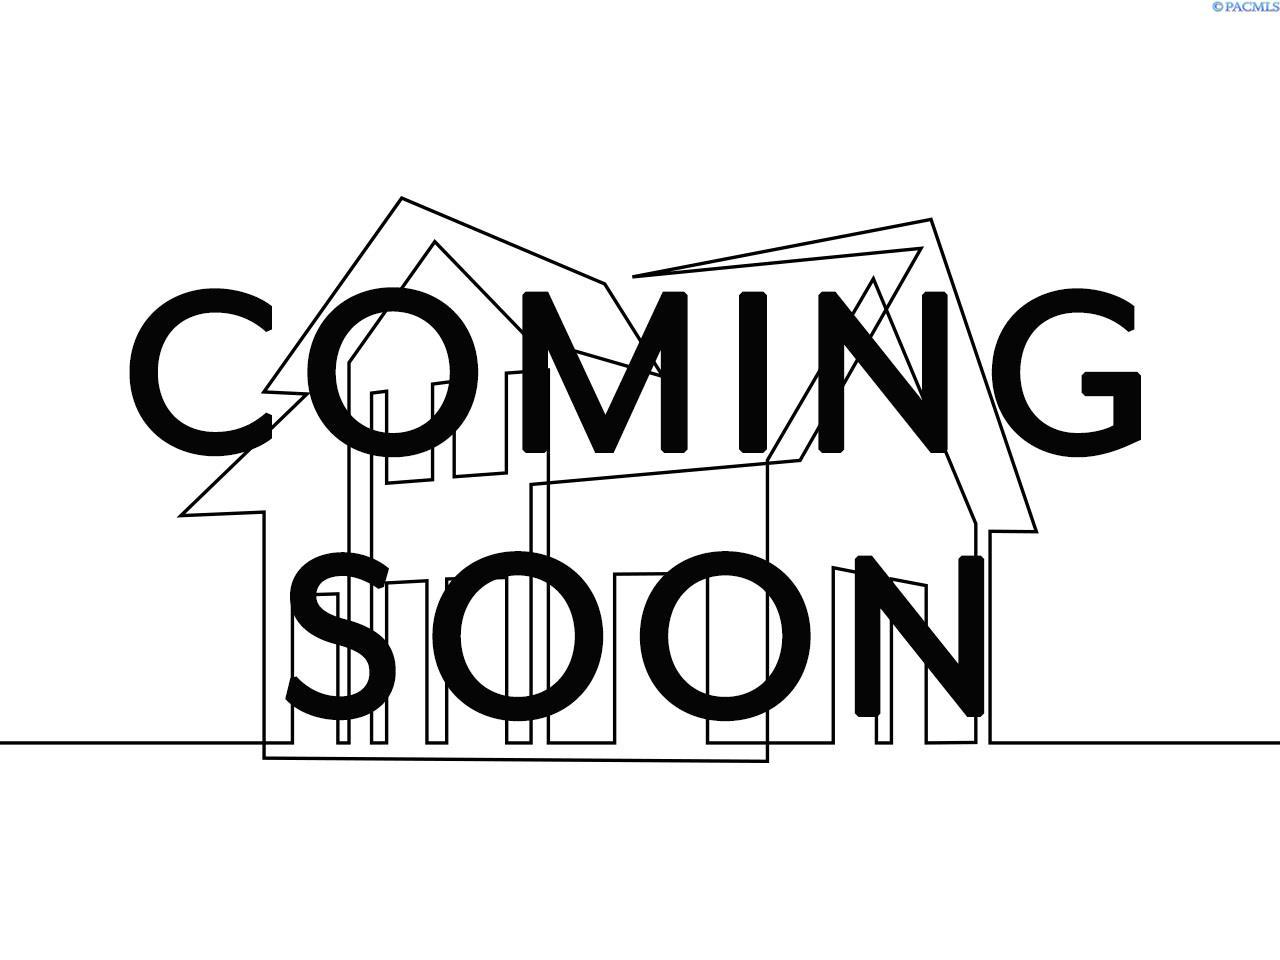 Single Family Homes for Sale at 724 N Oklahoma Street Kennewick, Washington 99226 United States